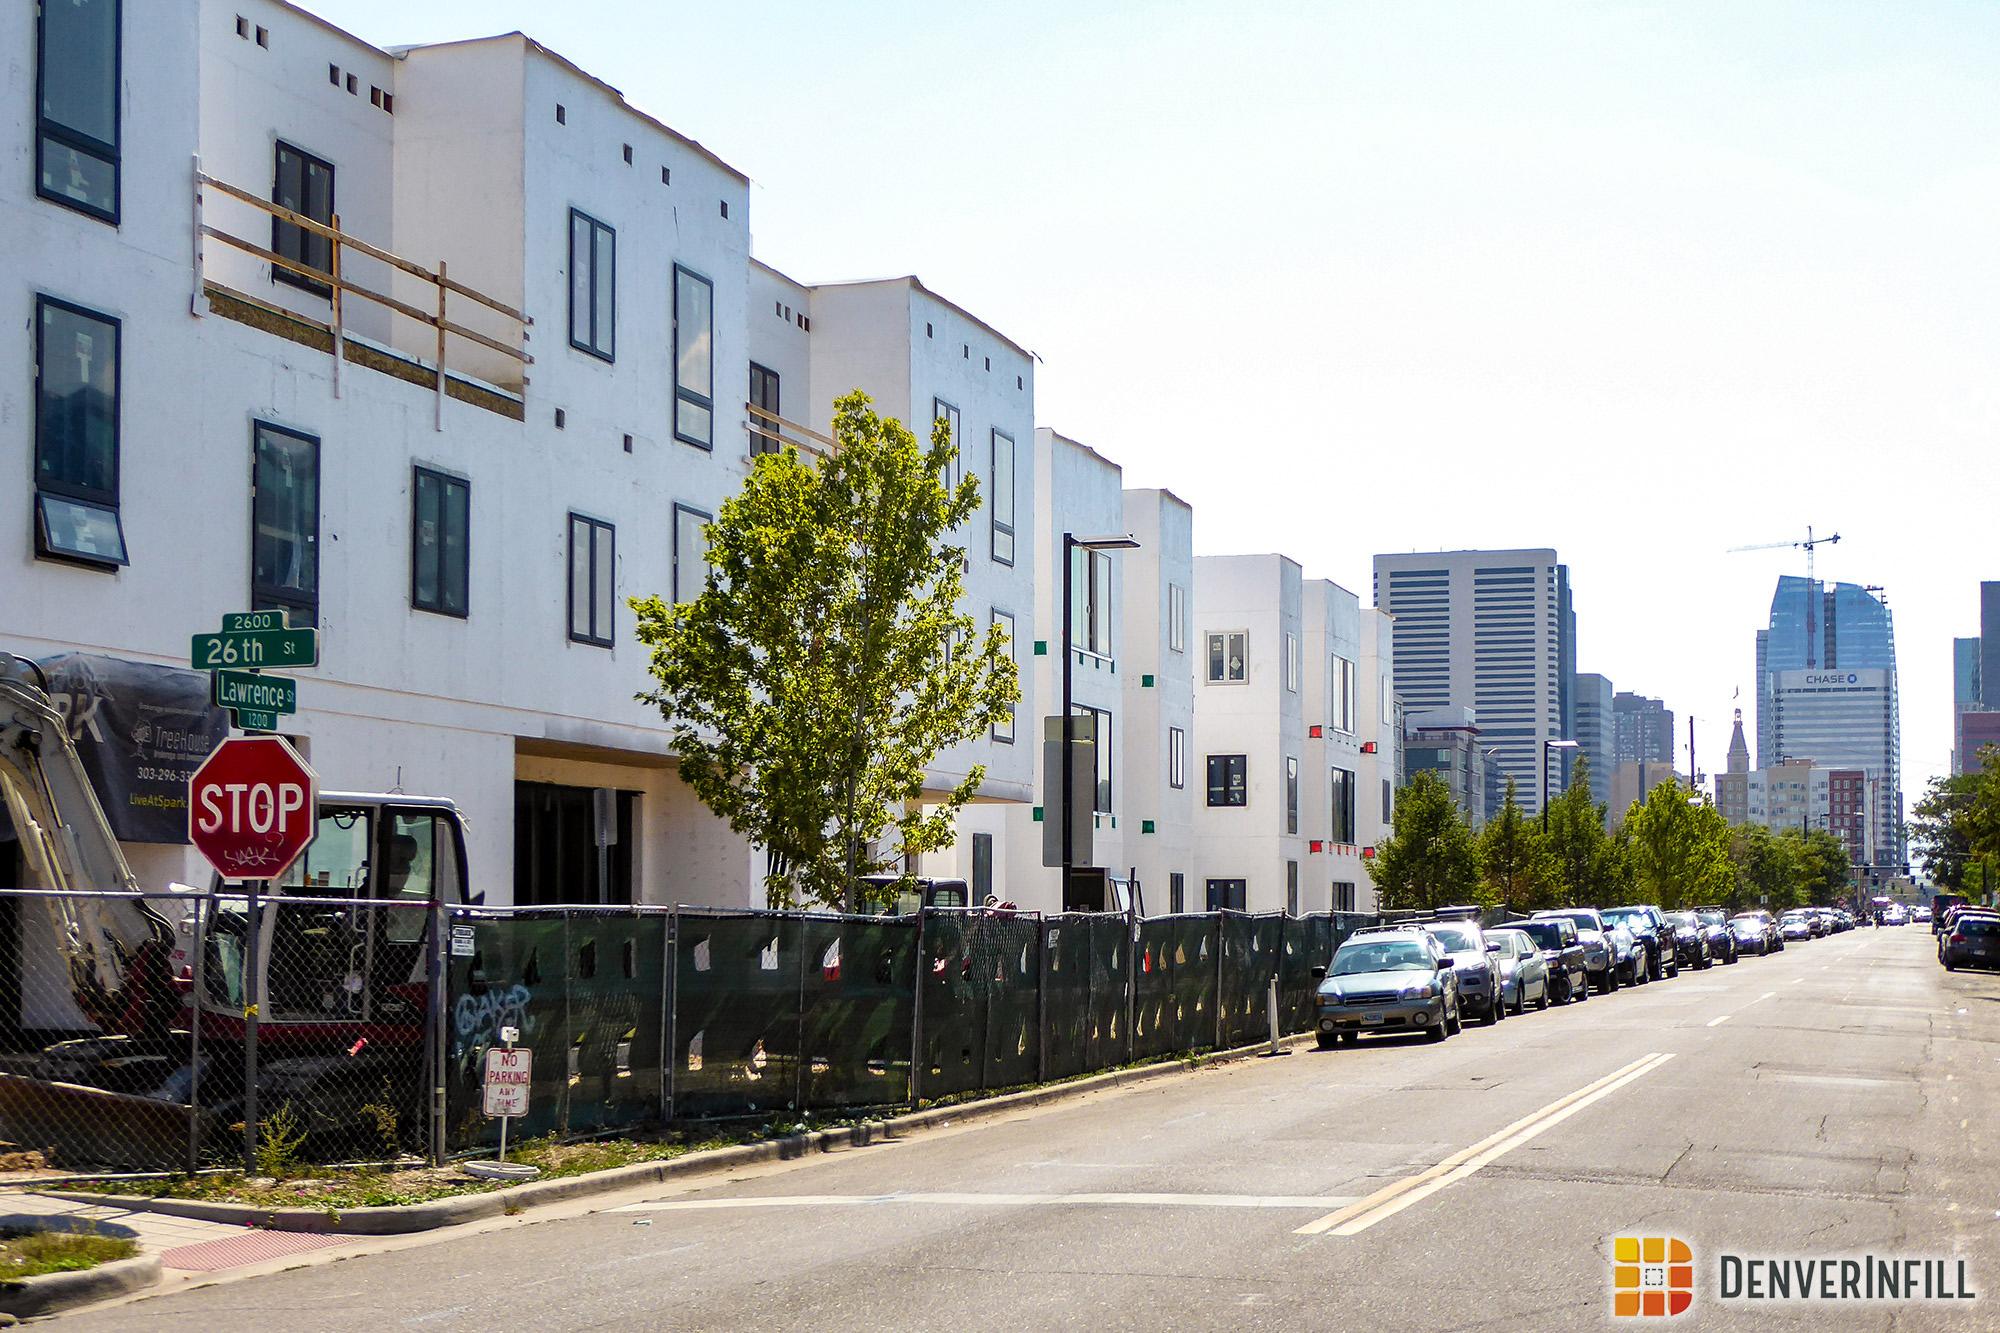 S*Park condominiums along Lawrence Street